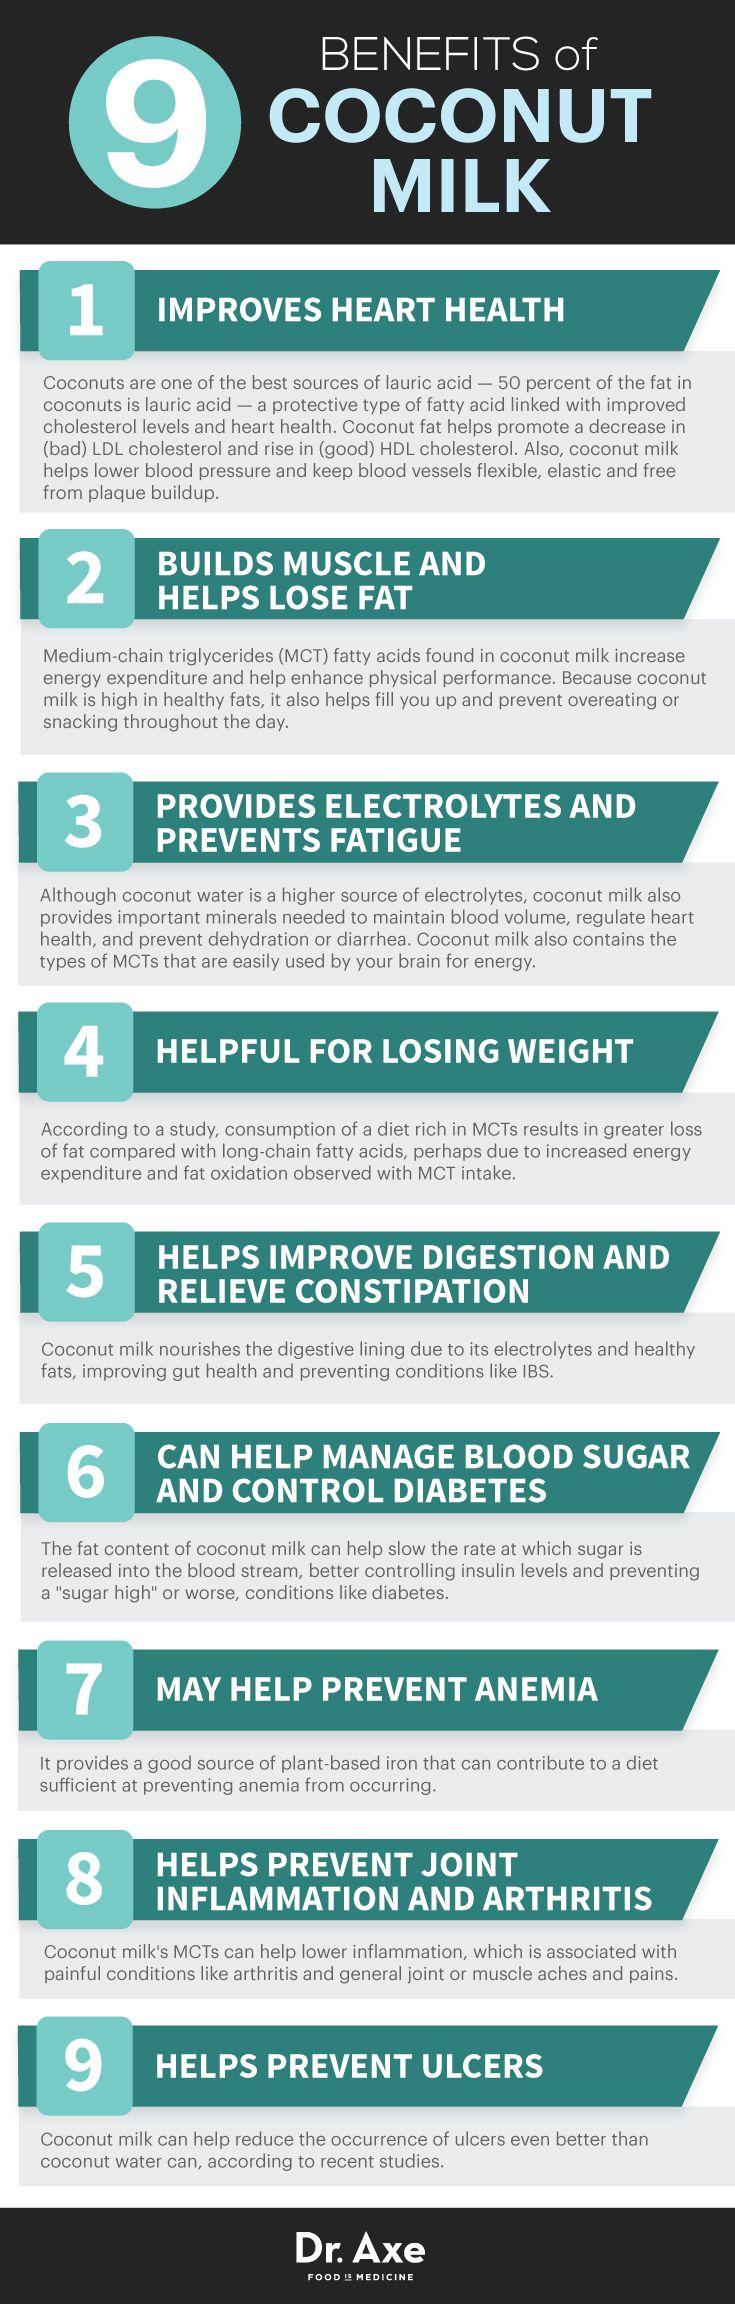 Best 25+ Milk nutrition facts ideas on Pinterest | Milk nutrition ...